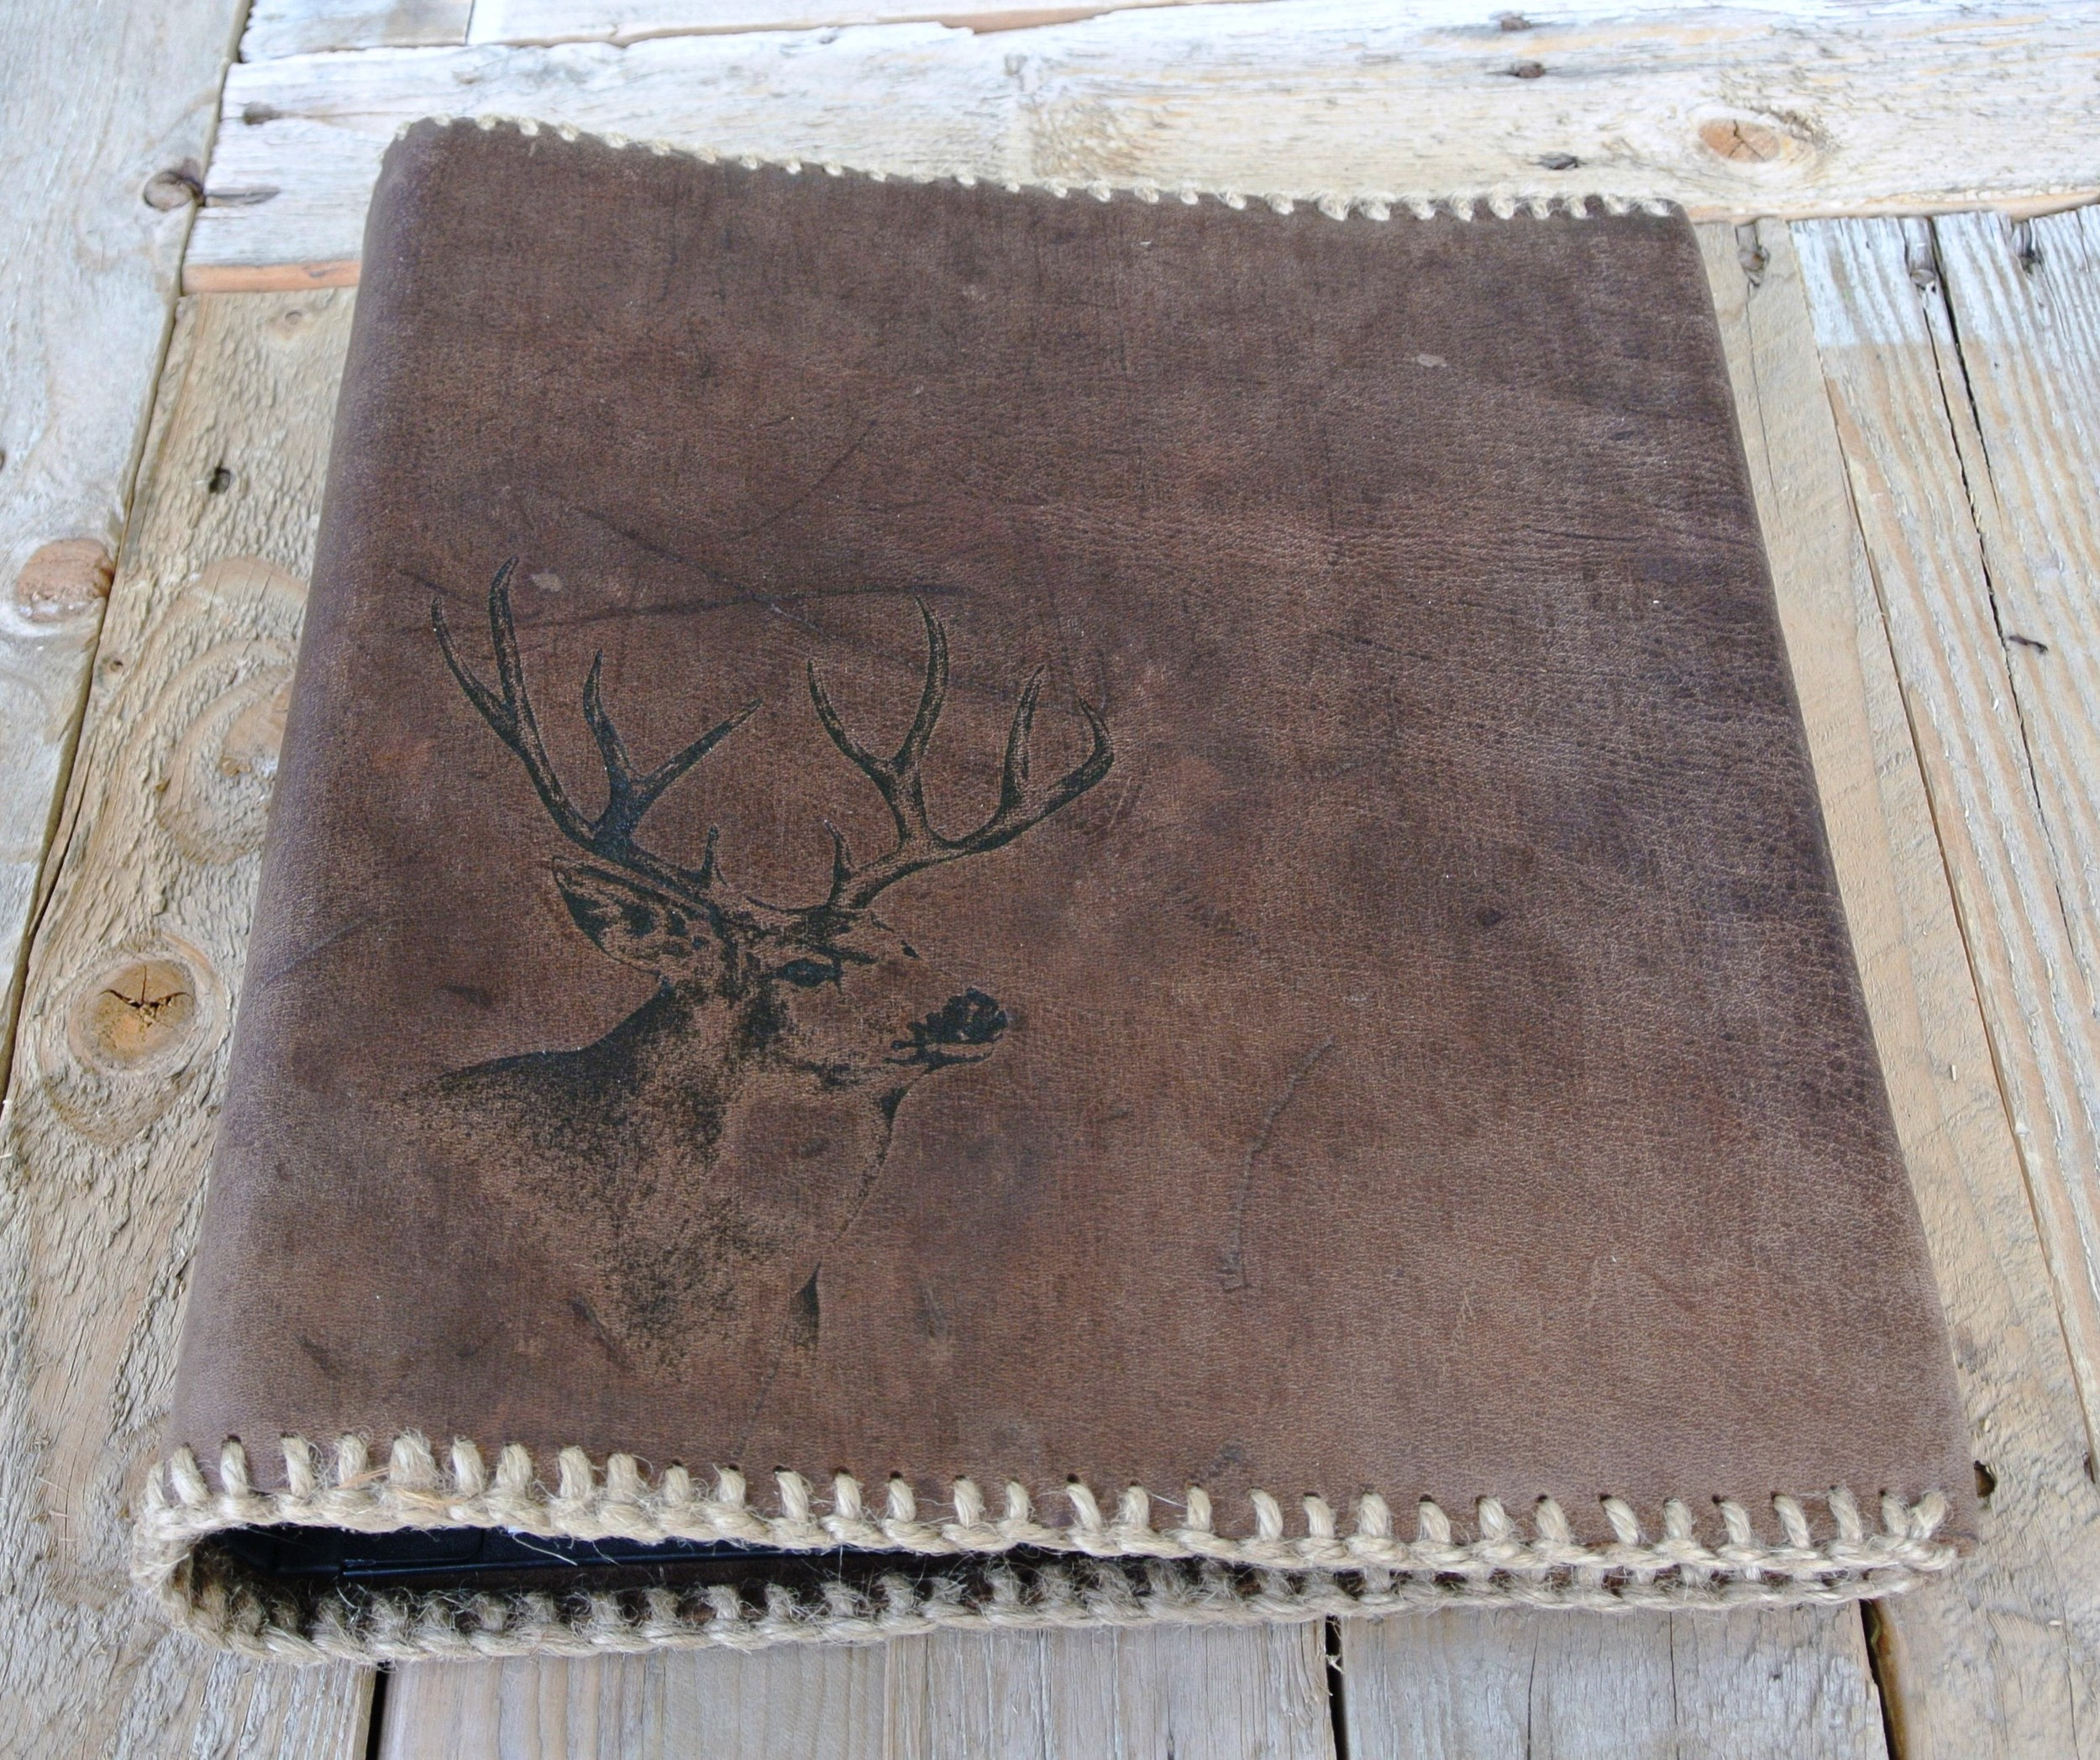 Circle M-Brand Leather Binder - Buck hunting.JPG